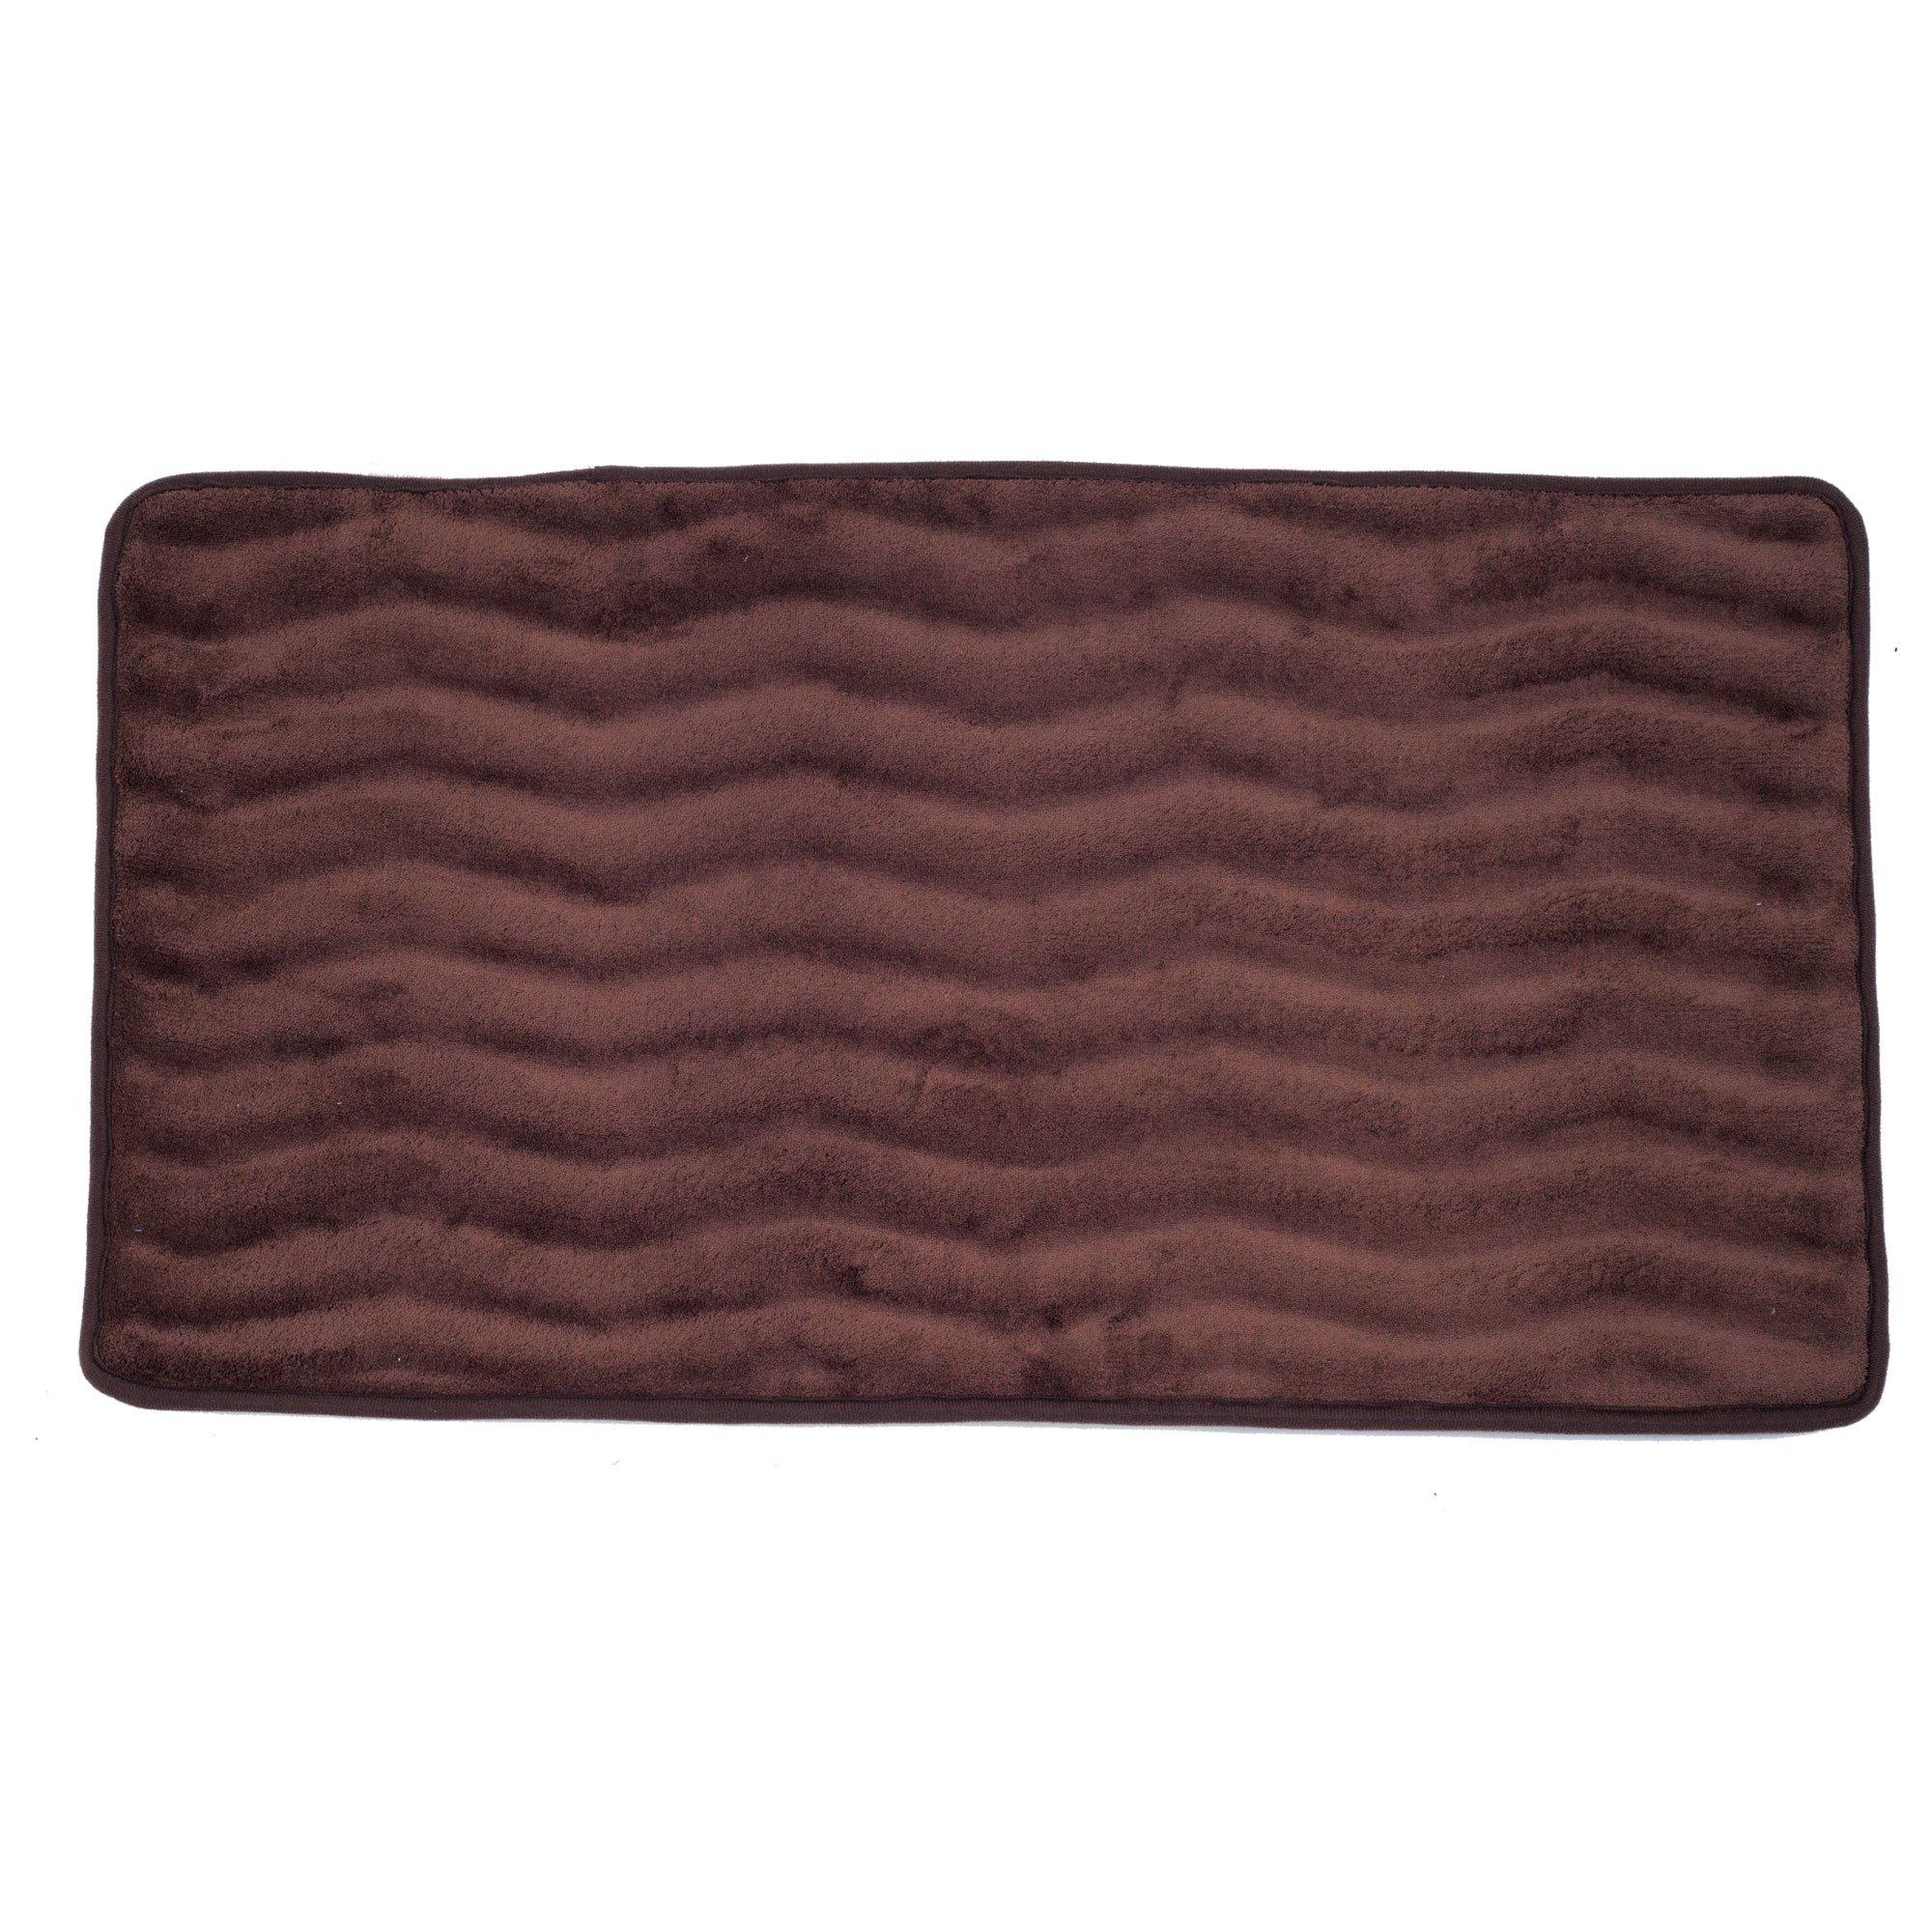 Lavish Home Memory Foam 24 by 60-Inch Bath Mat, Chocolate, X-Long